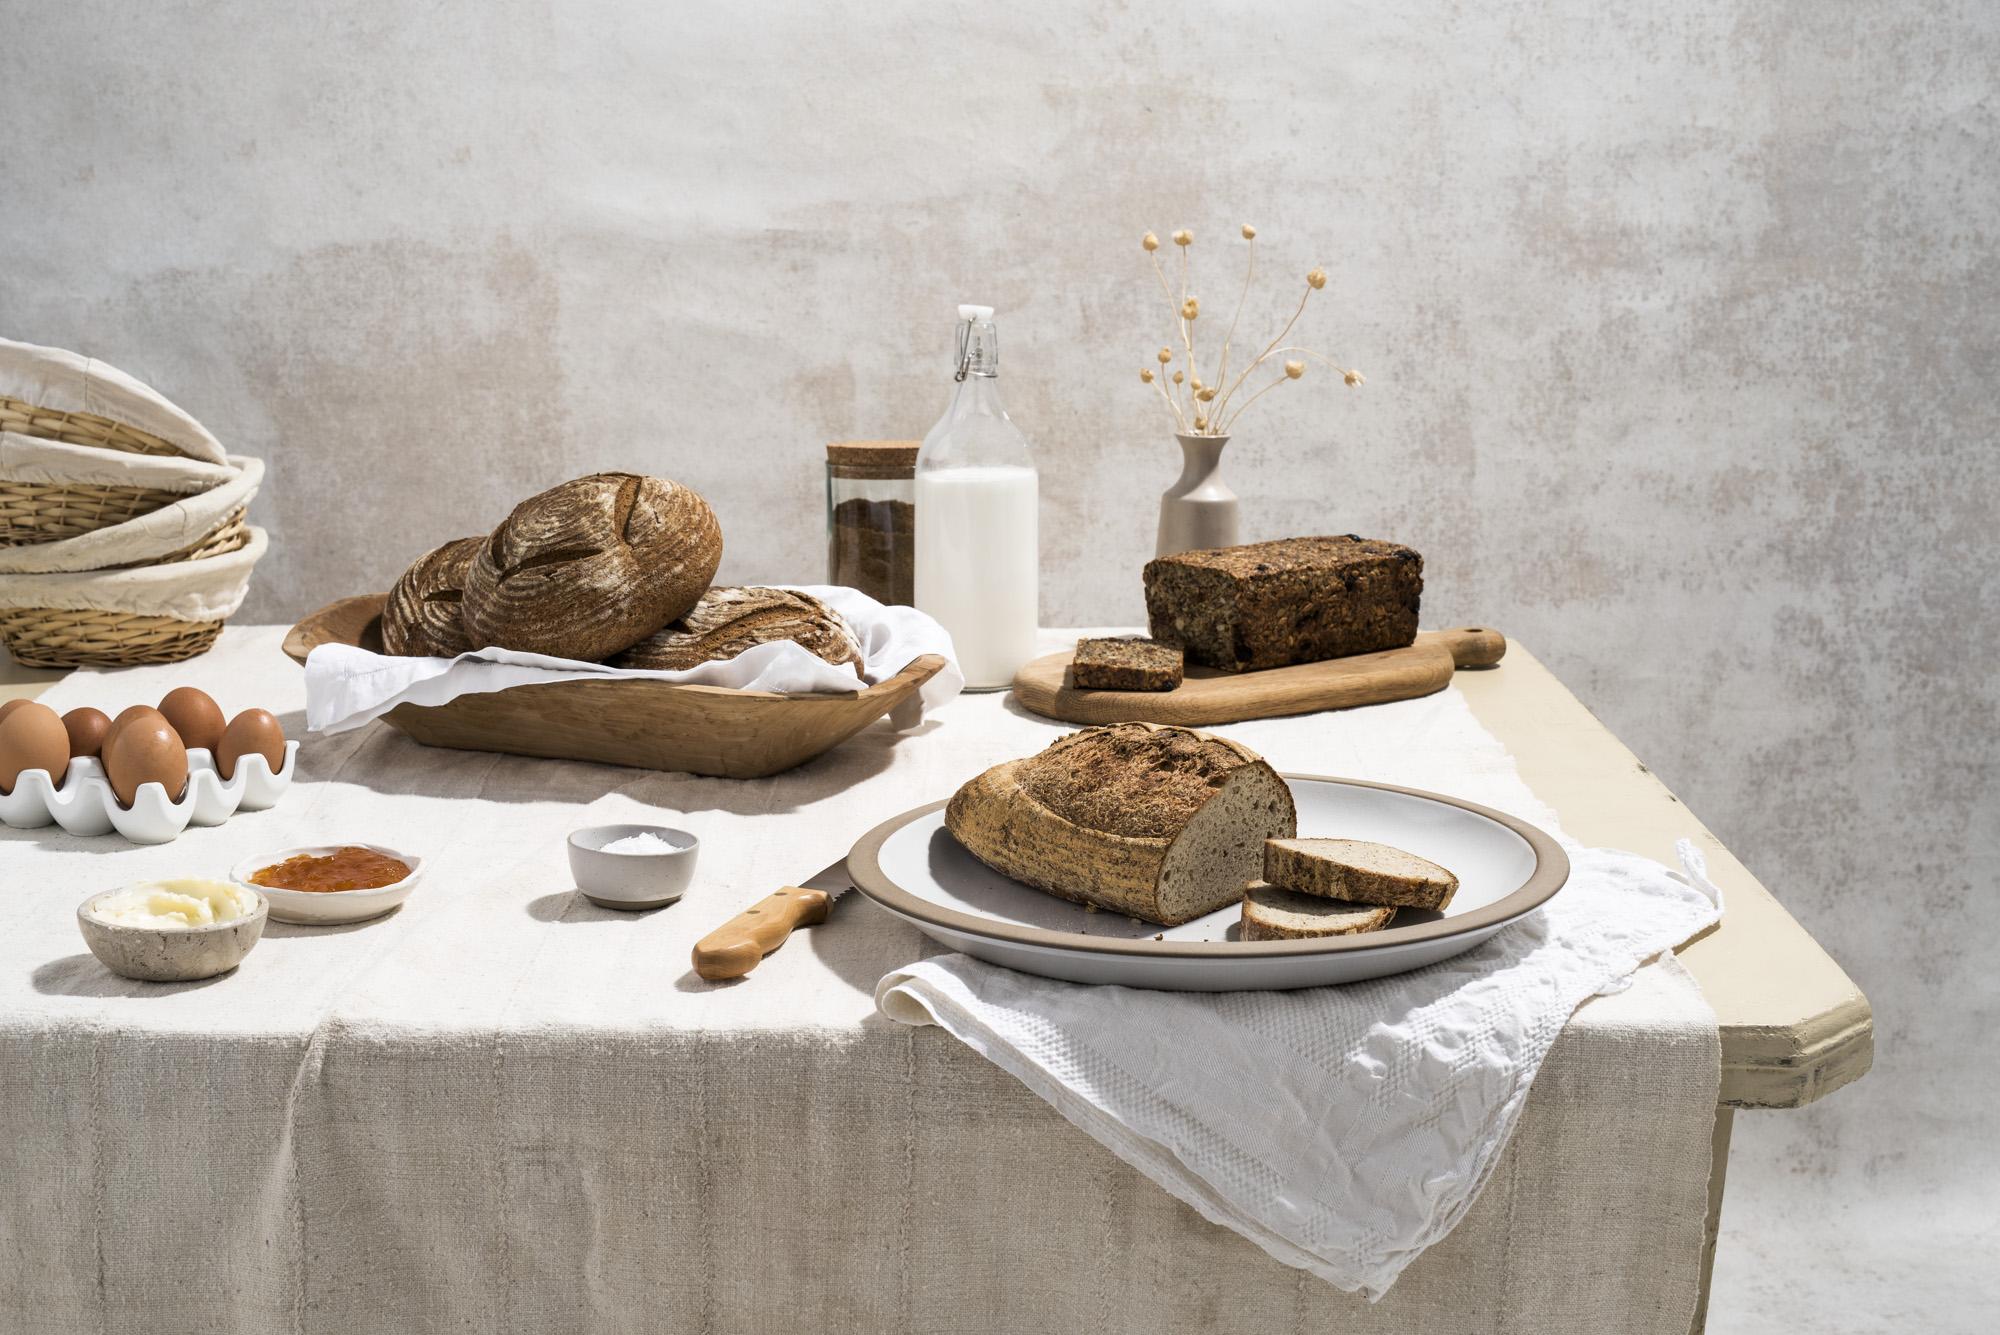 Breadblok_0120.jpg